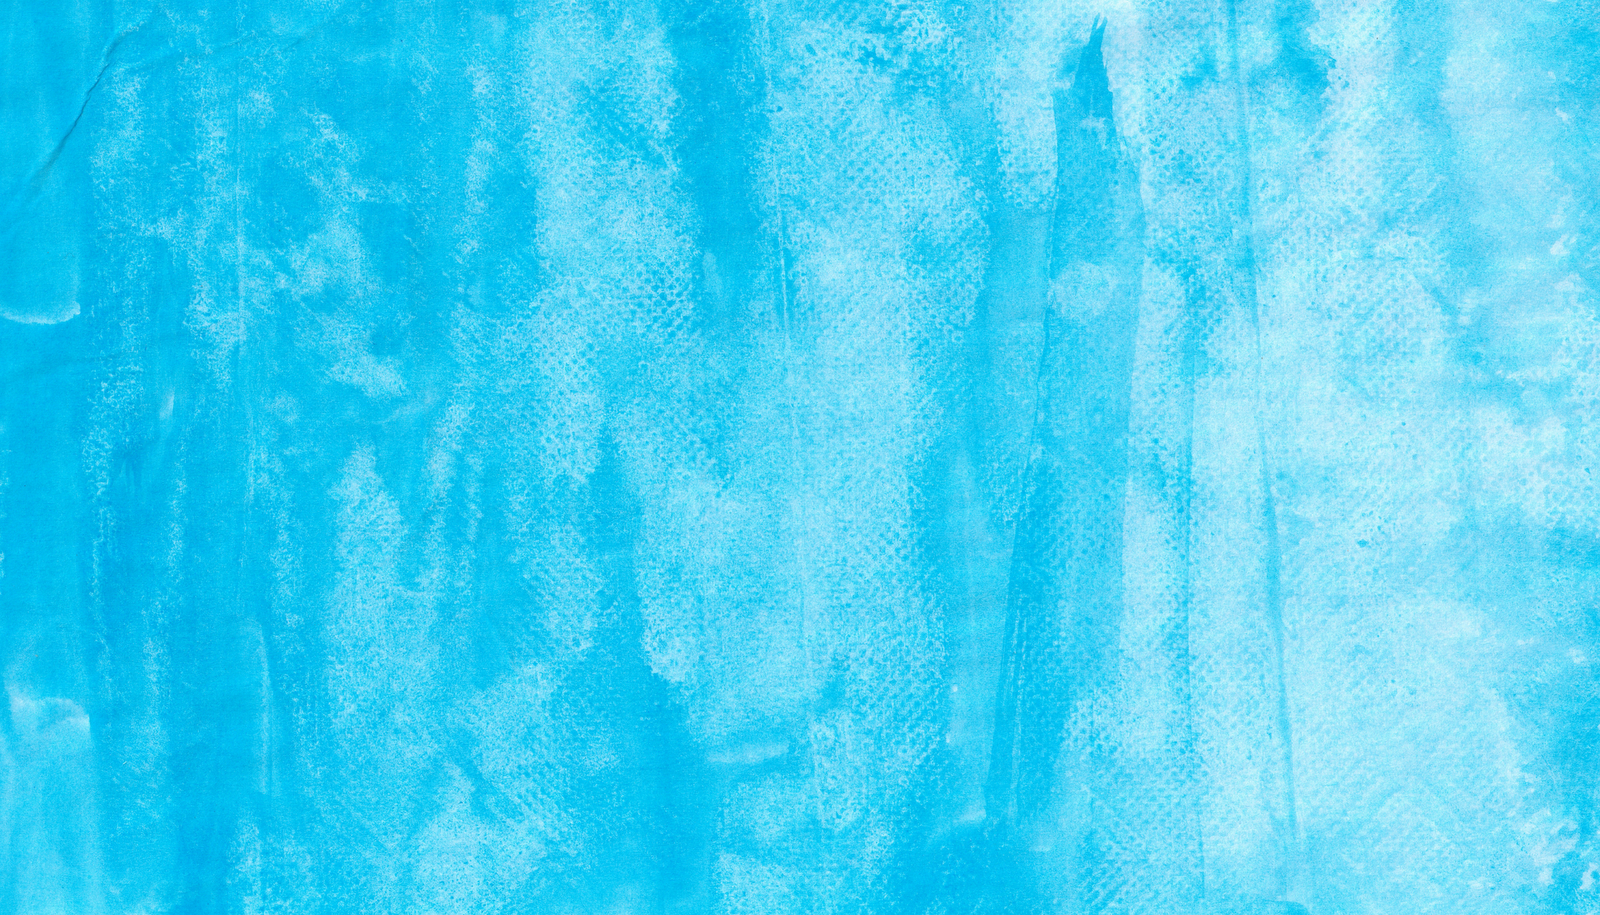 reusage-blog-free-texture-paper-blue-watercolor-like ...